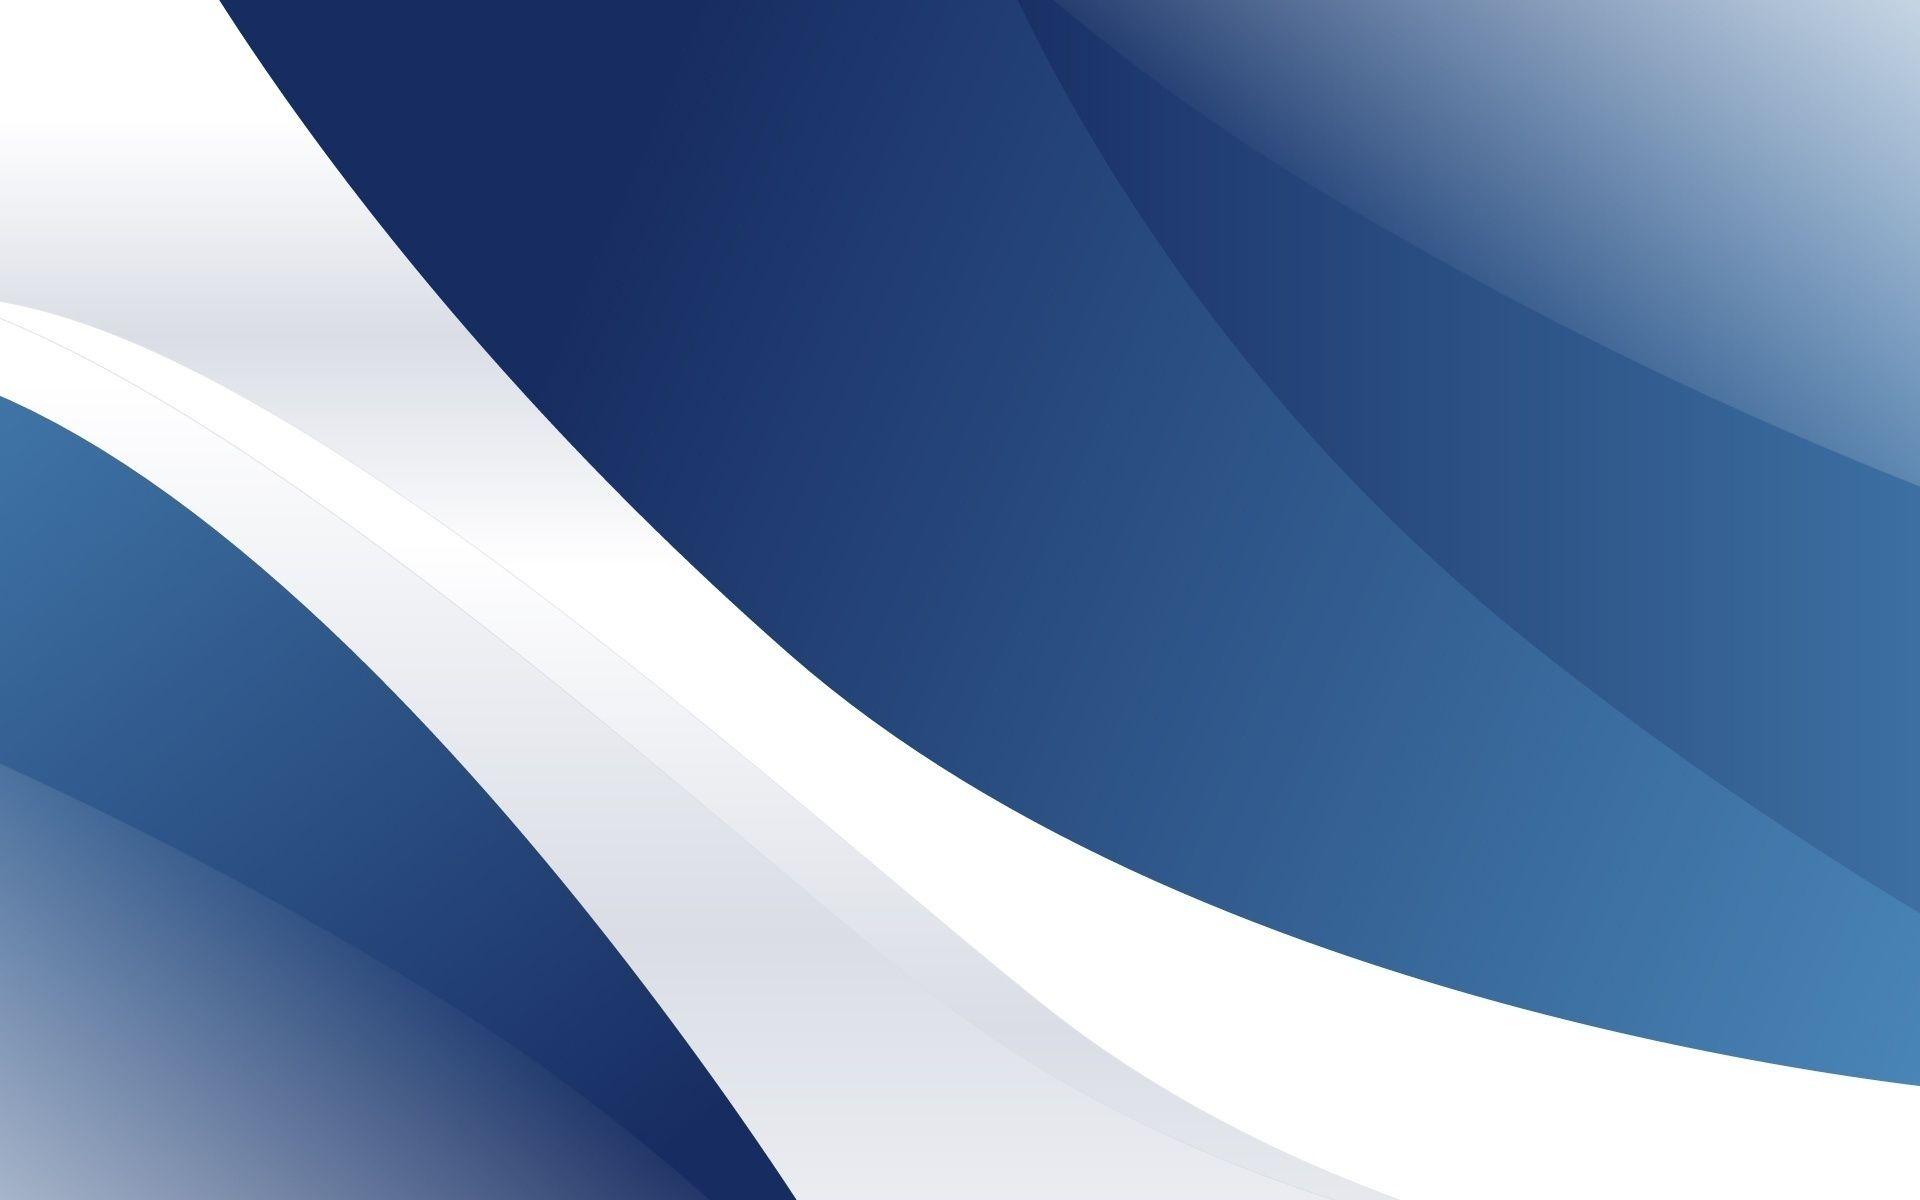 Background Modern Pixel Wallpaper Effect Abstract Wallpapers Large Blue Blue Background Wallpapers White Background Hd Blue White Background